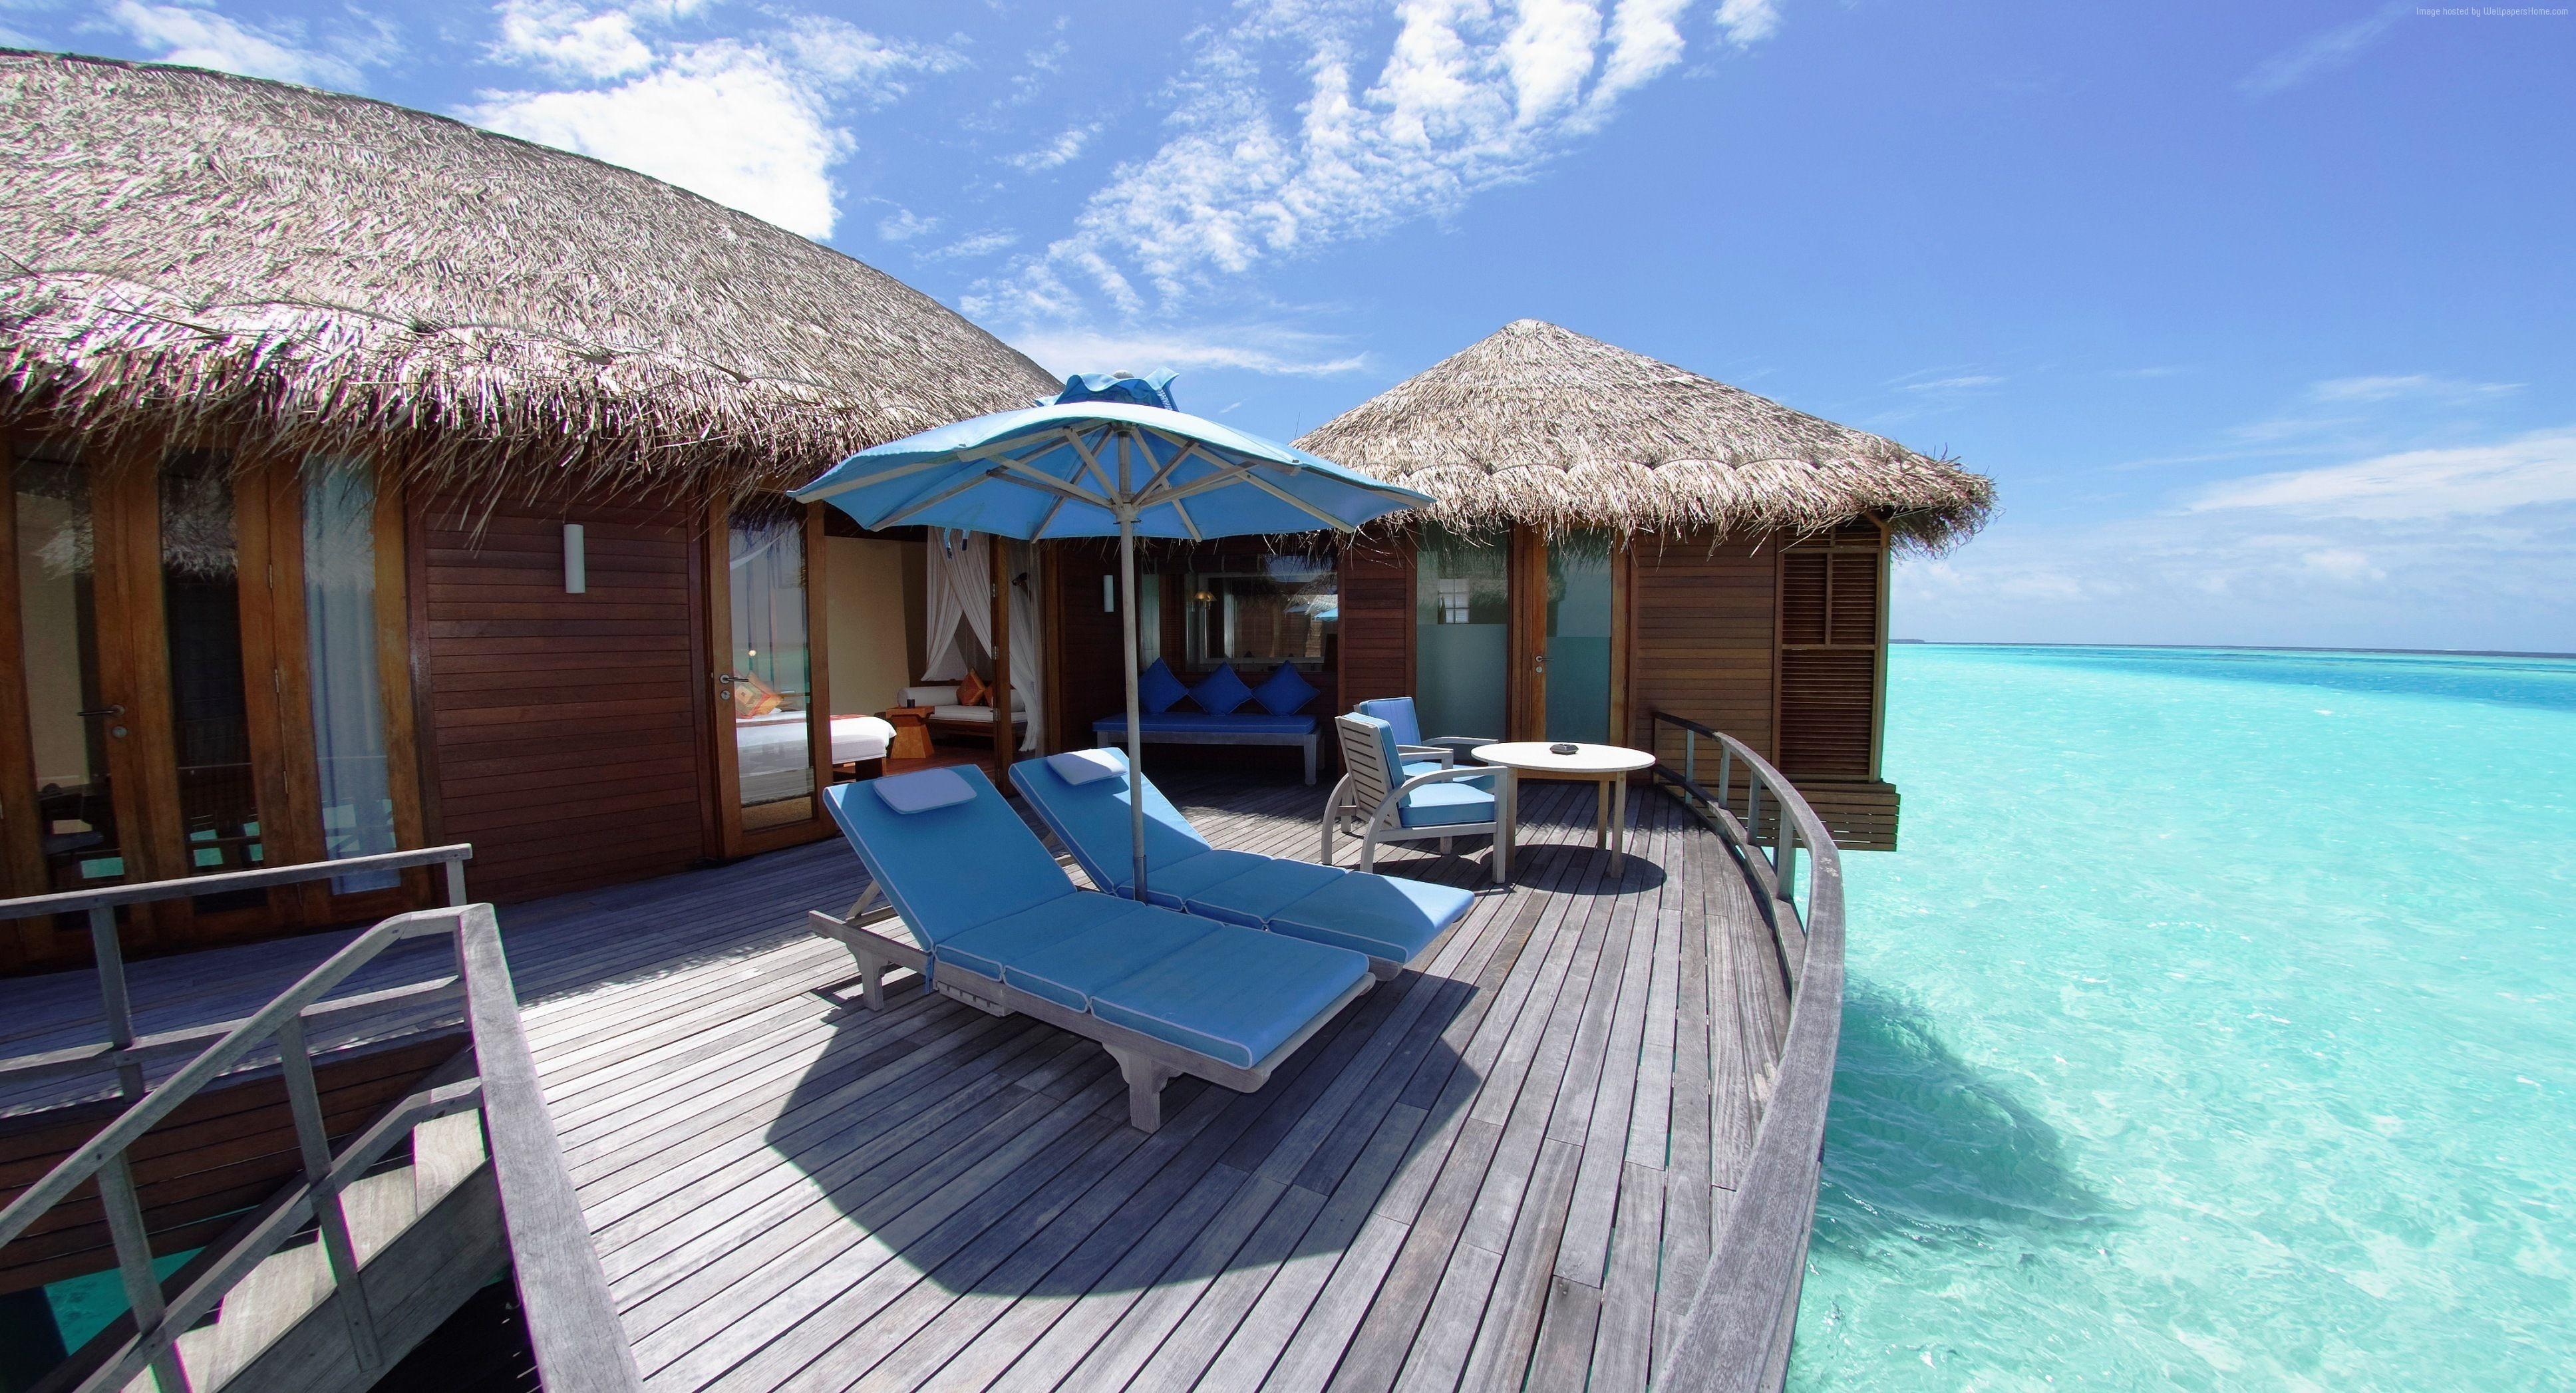 Maldives Anantara Kihavah 1